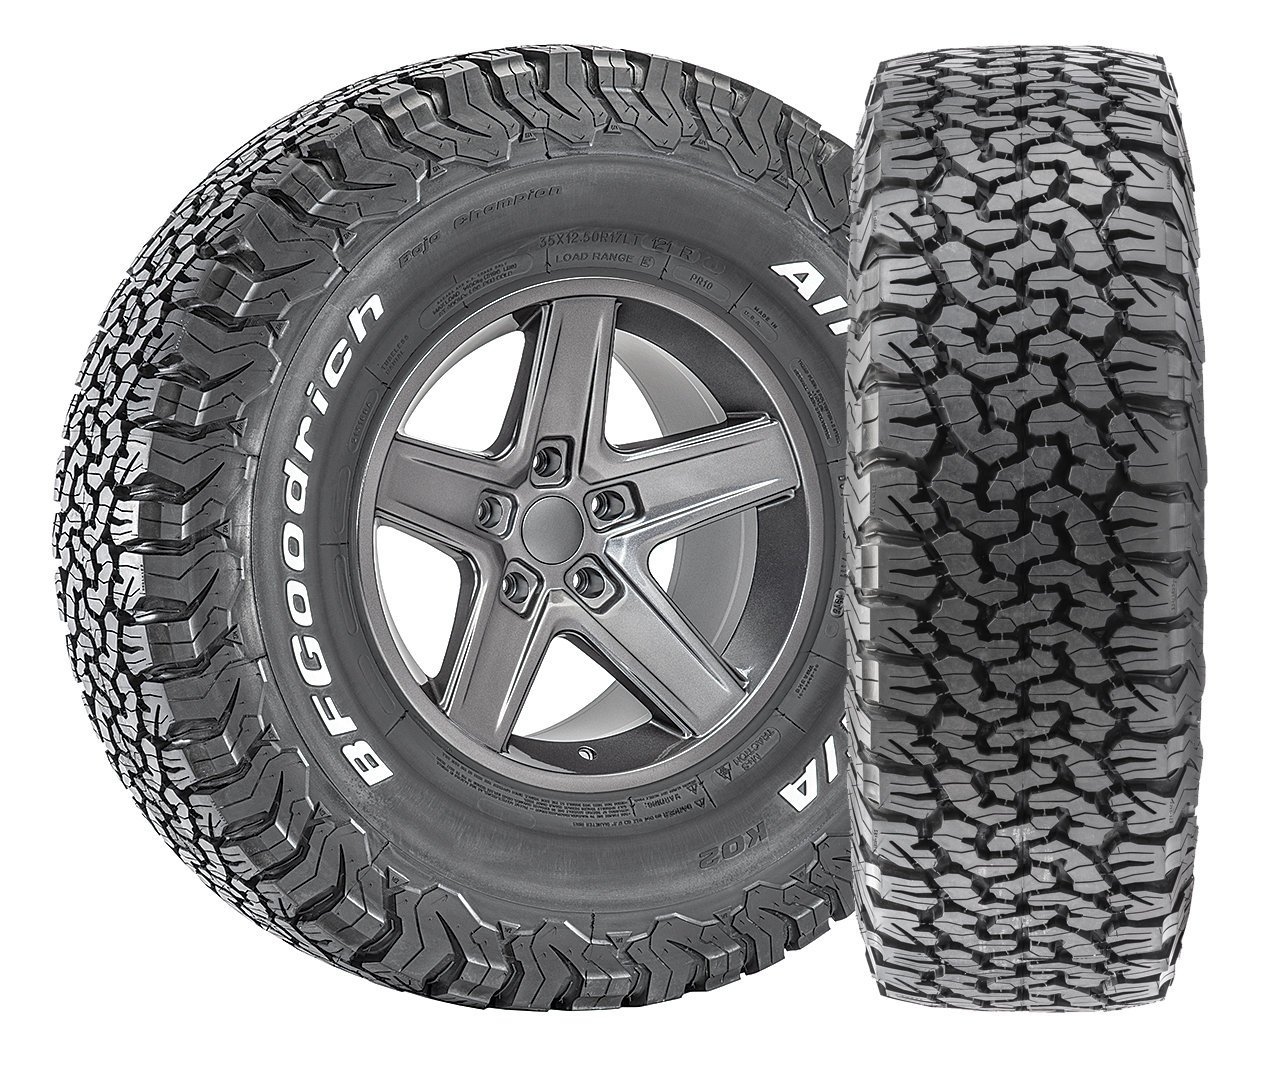 BFGoodrich All- Terrain T/A KO2 Radial Tire-LT215/75R15 100C 44092